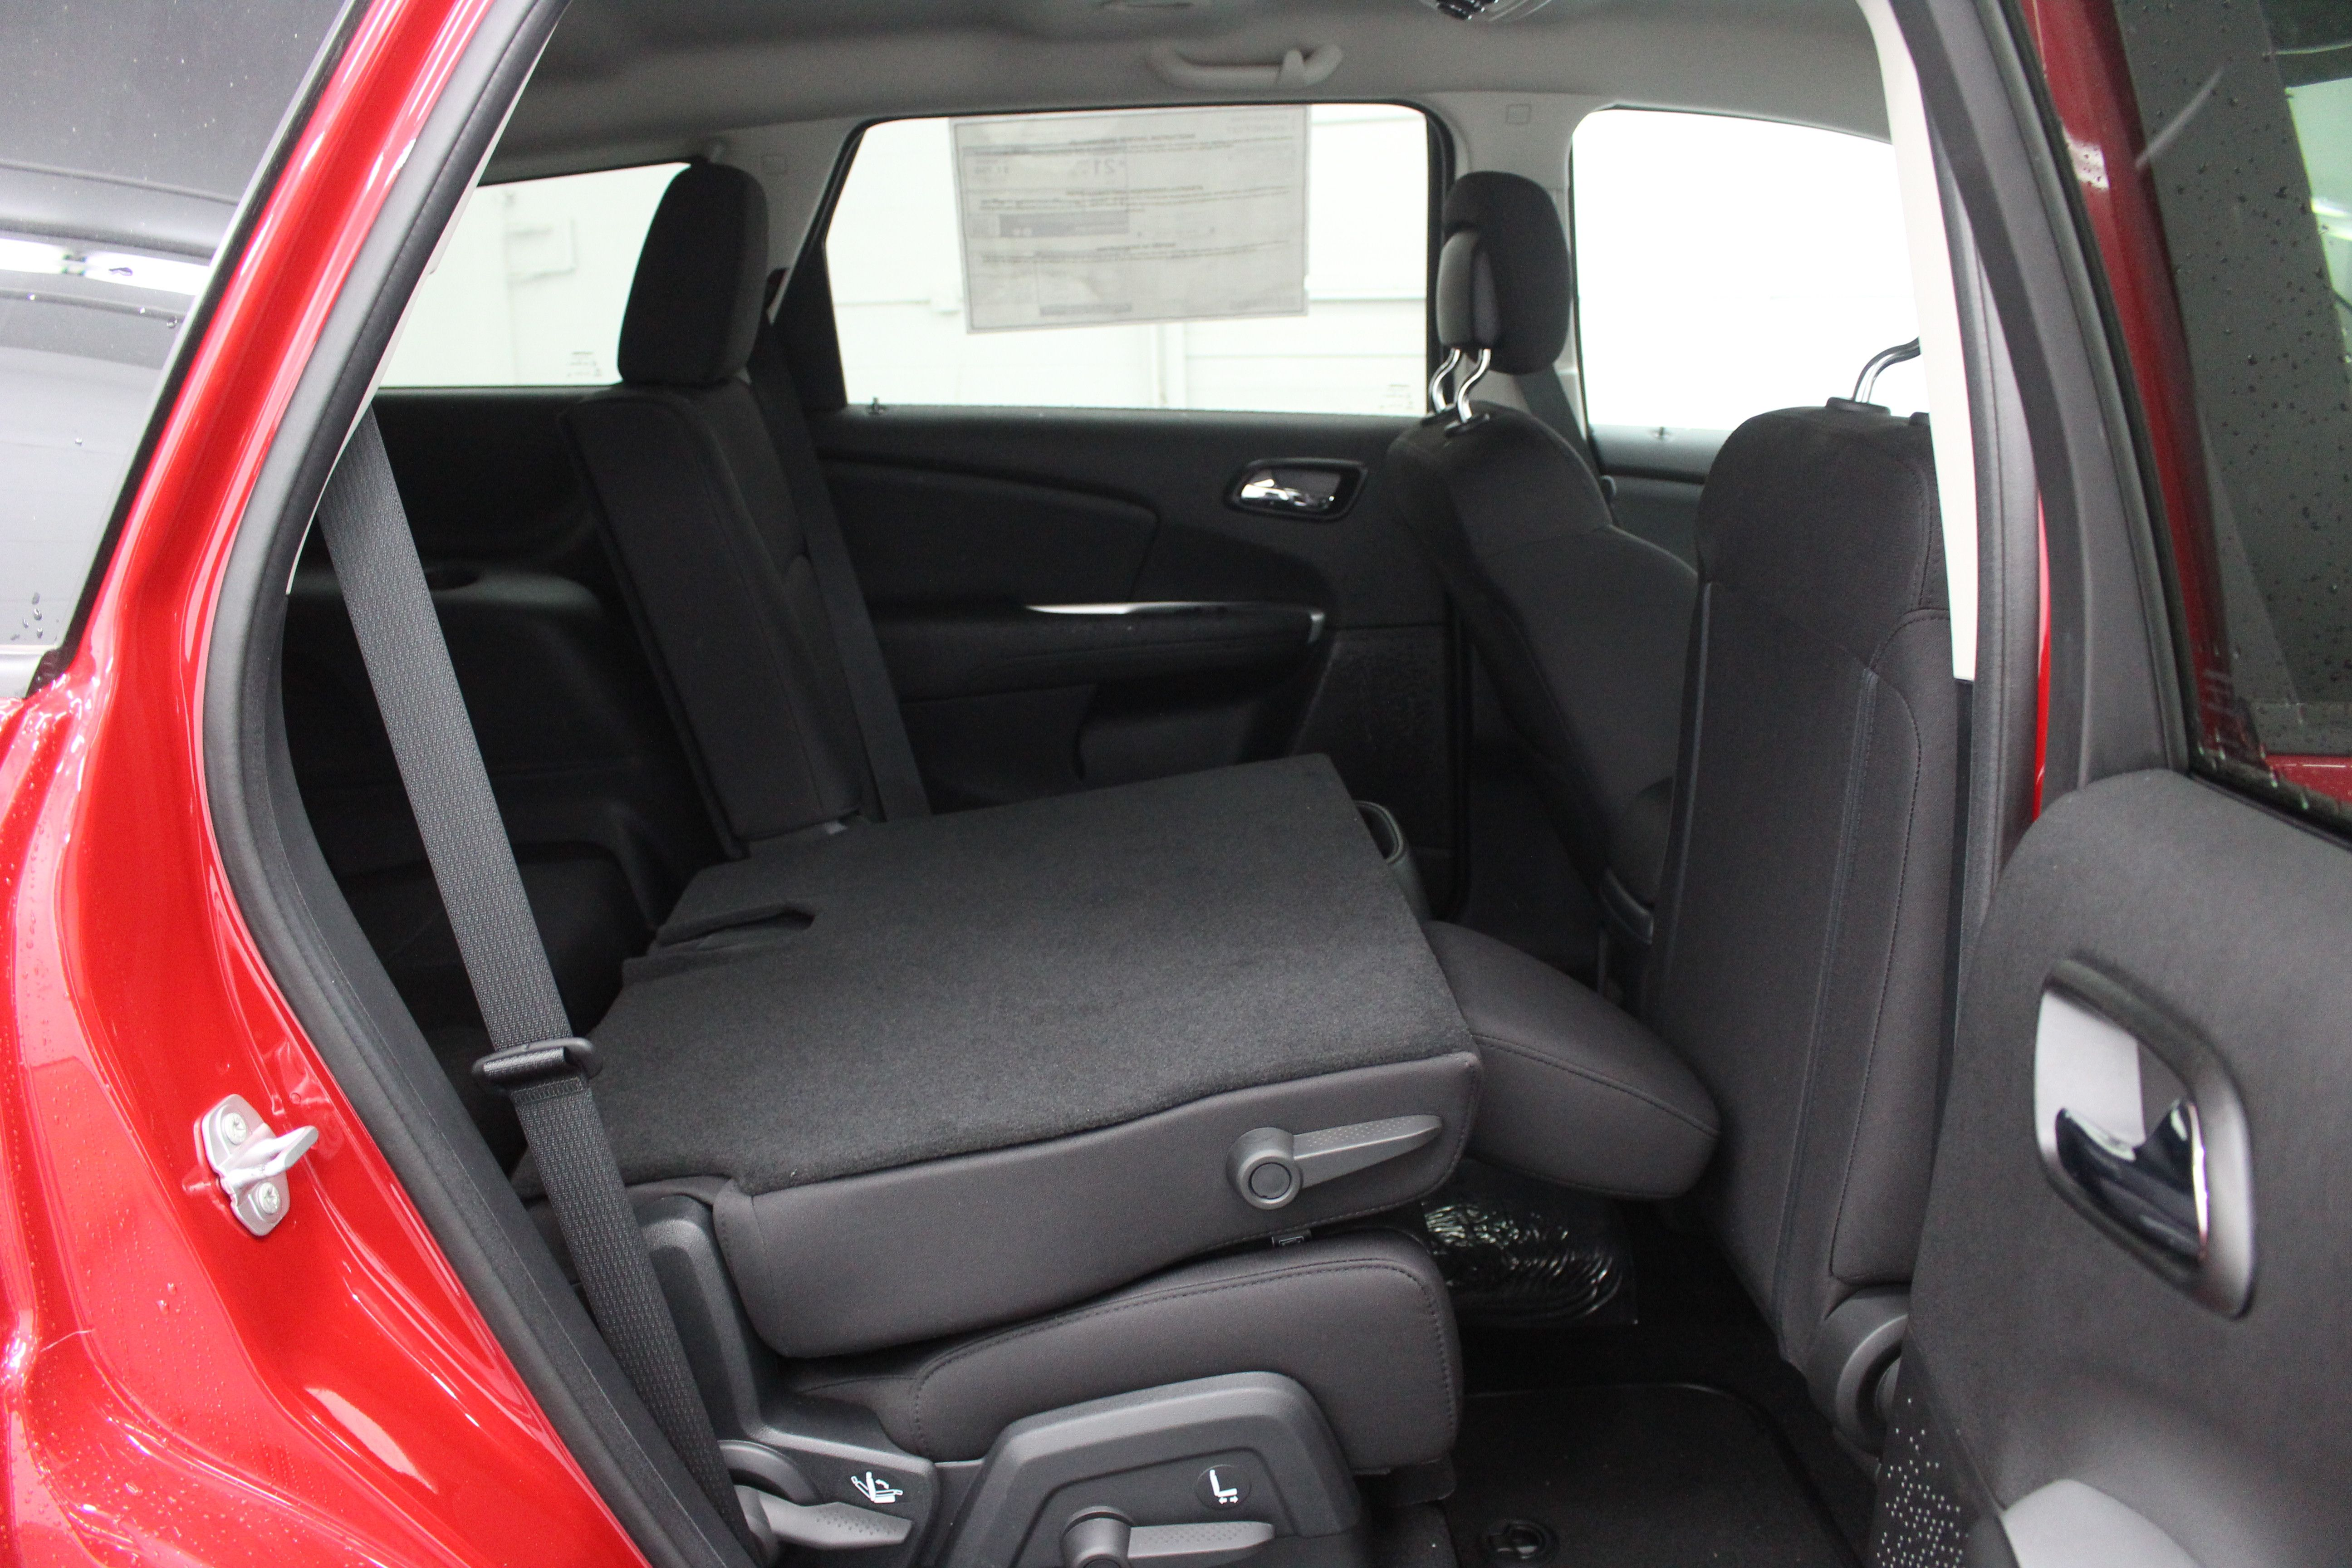 Toyota Prius v (+) I (ZVW40ኅ) 2011 - 2014 Station wagon 5 door #1